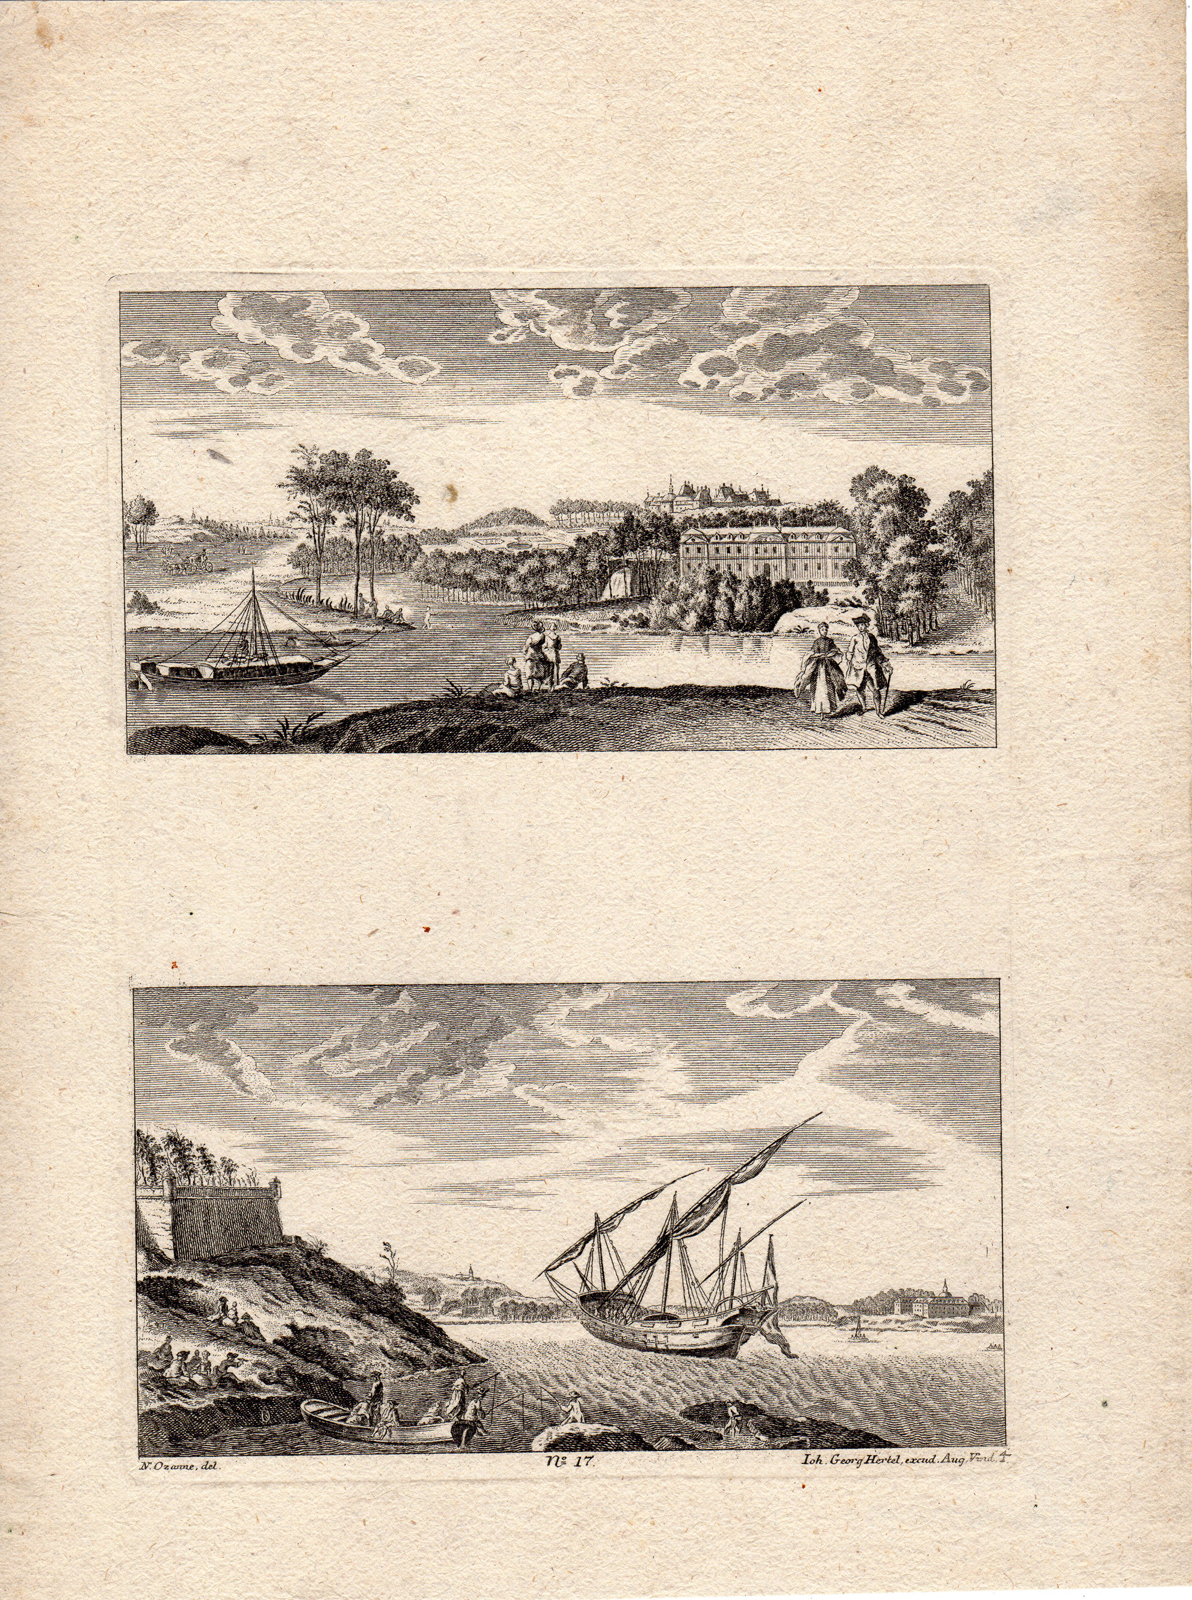 2 Antique Prints-LANDSCAPE-MARINE- SHIP-Ozanne-Hertel-c.1750: Johann Georg Hertel